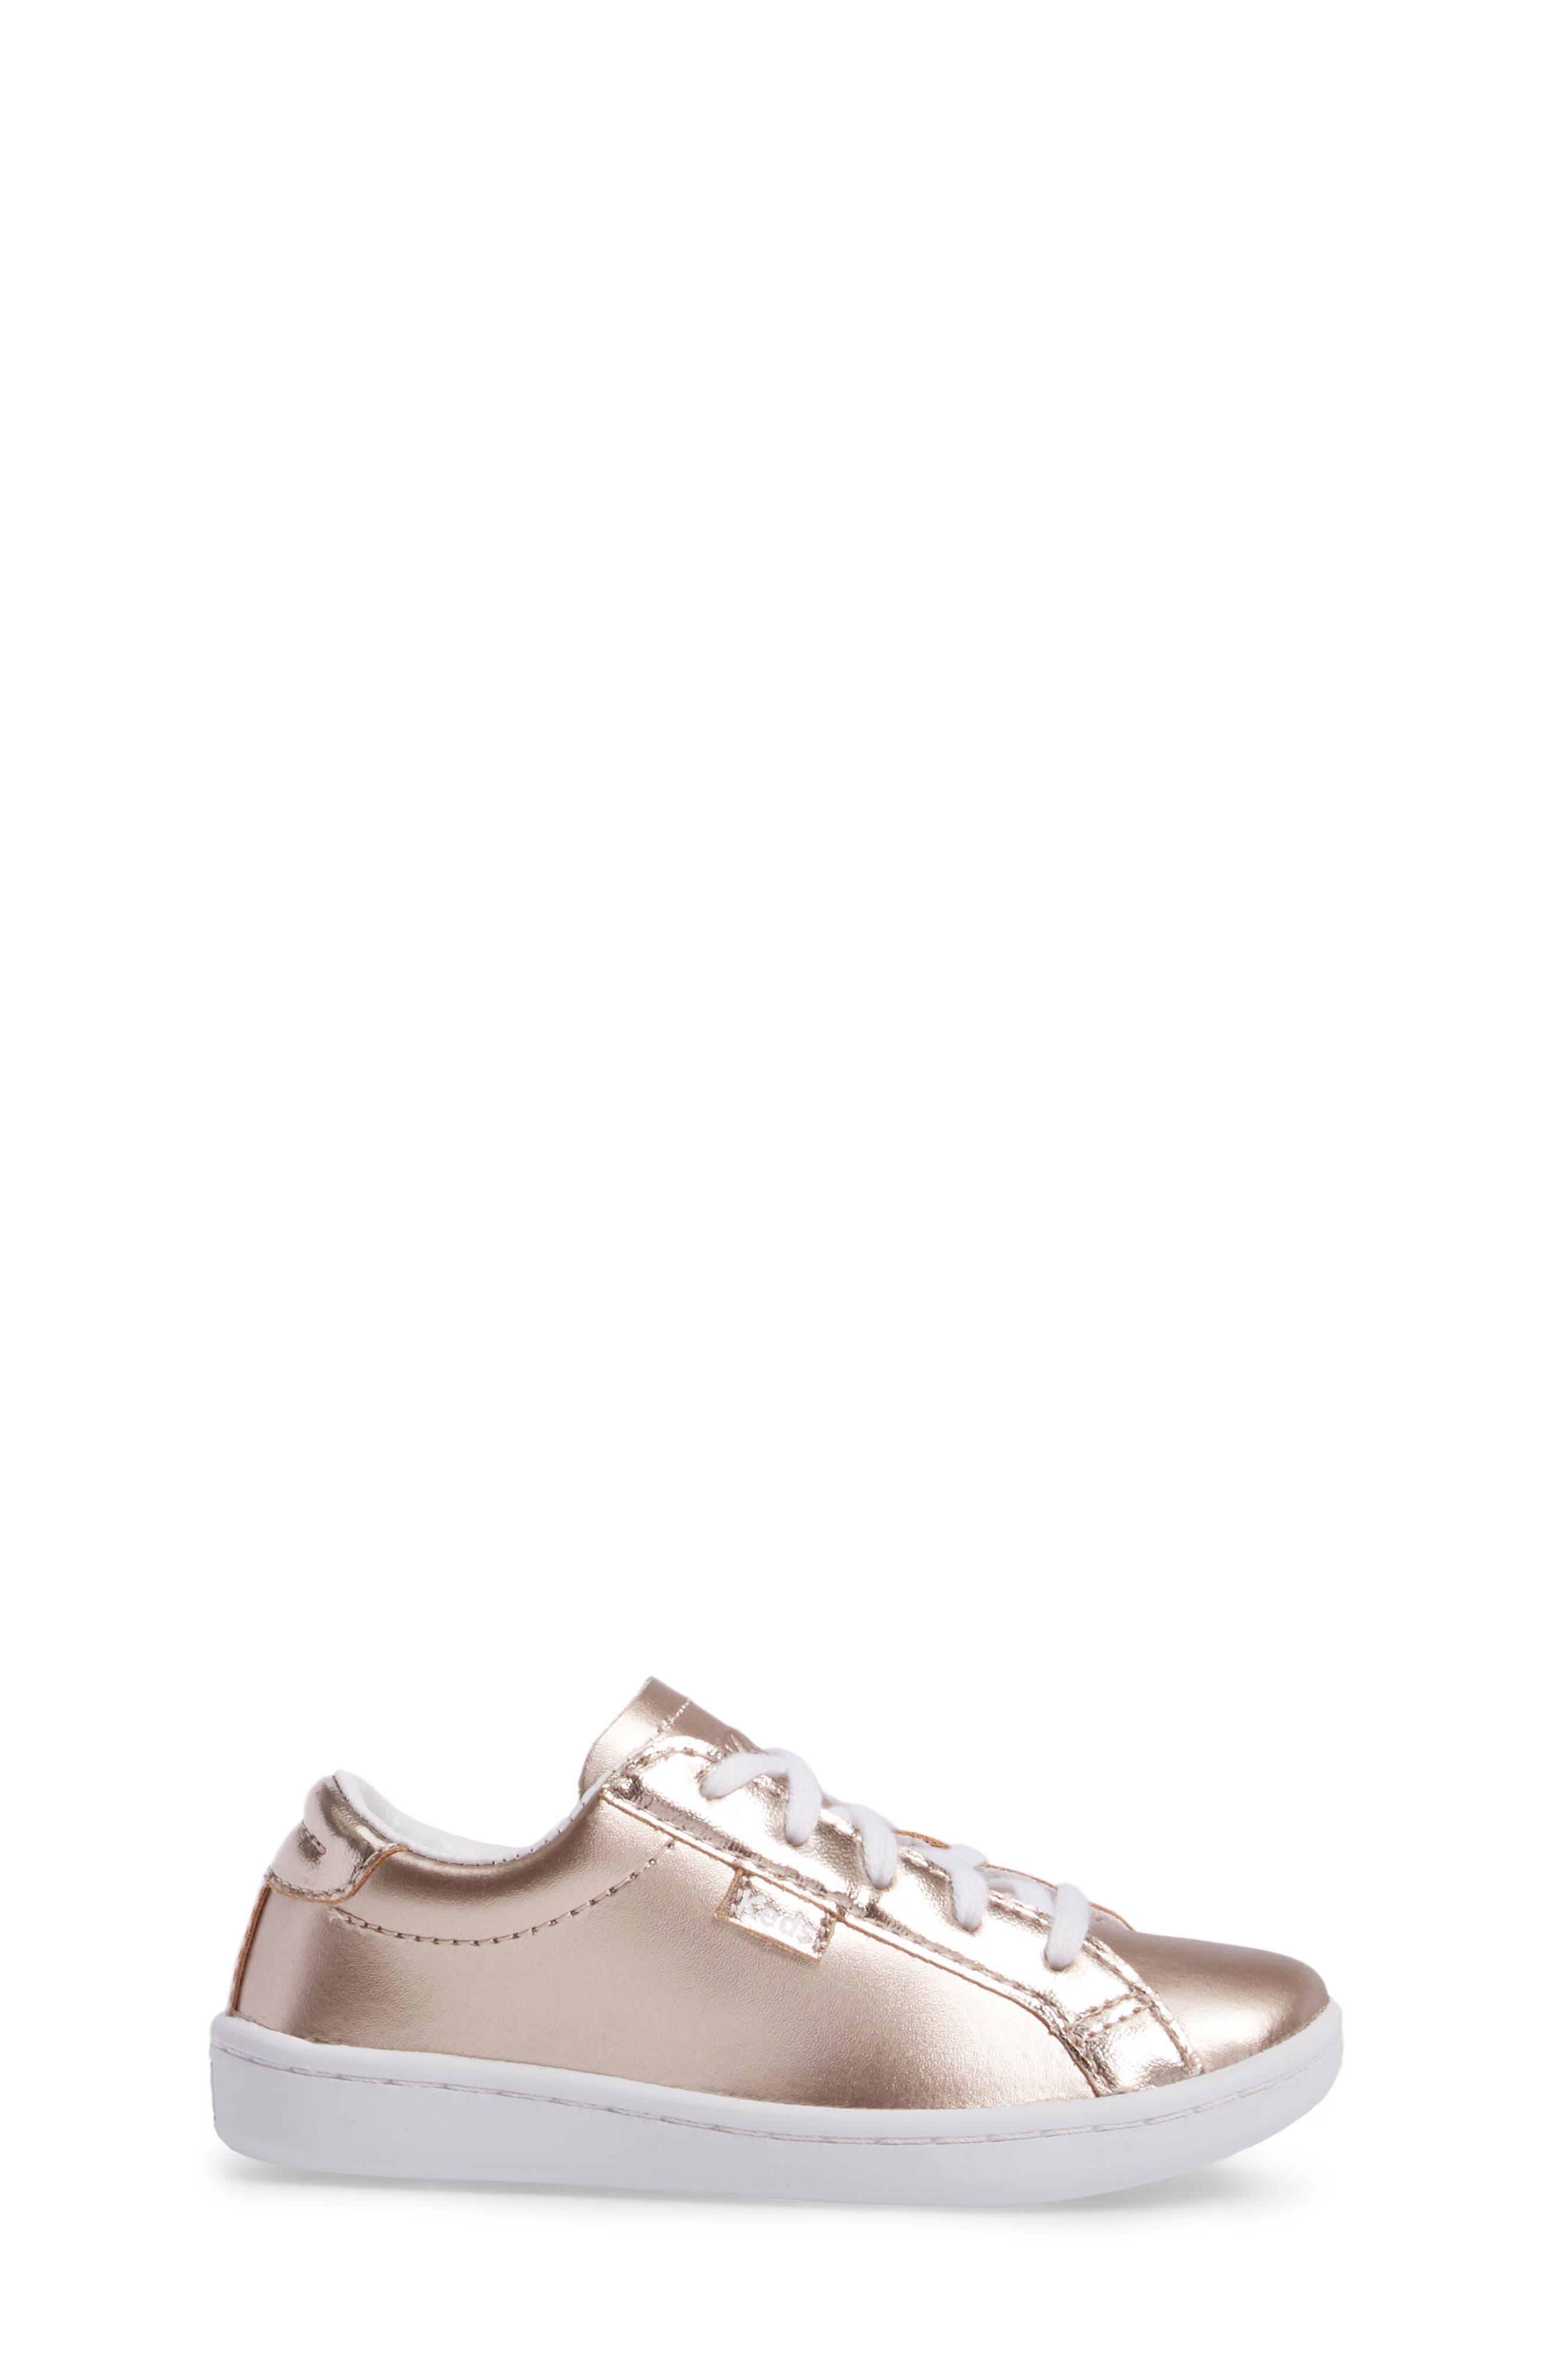 Ace Sneaker,                             Alternate thumbnail 3, color,                             220